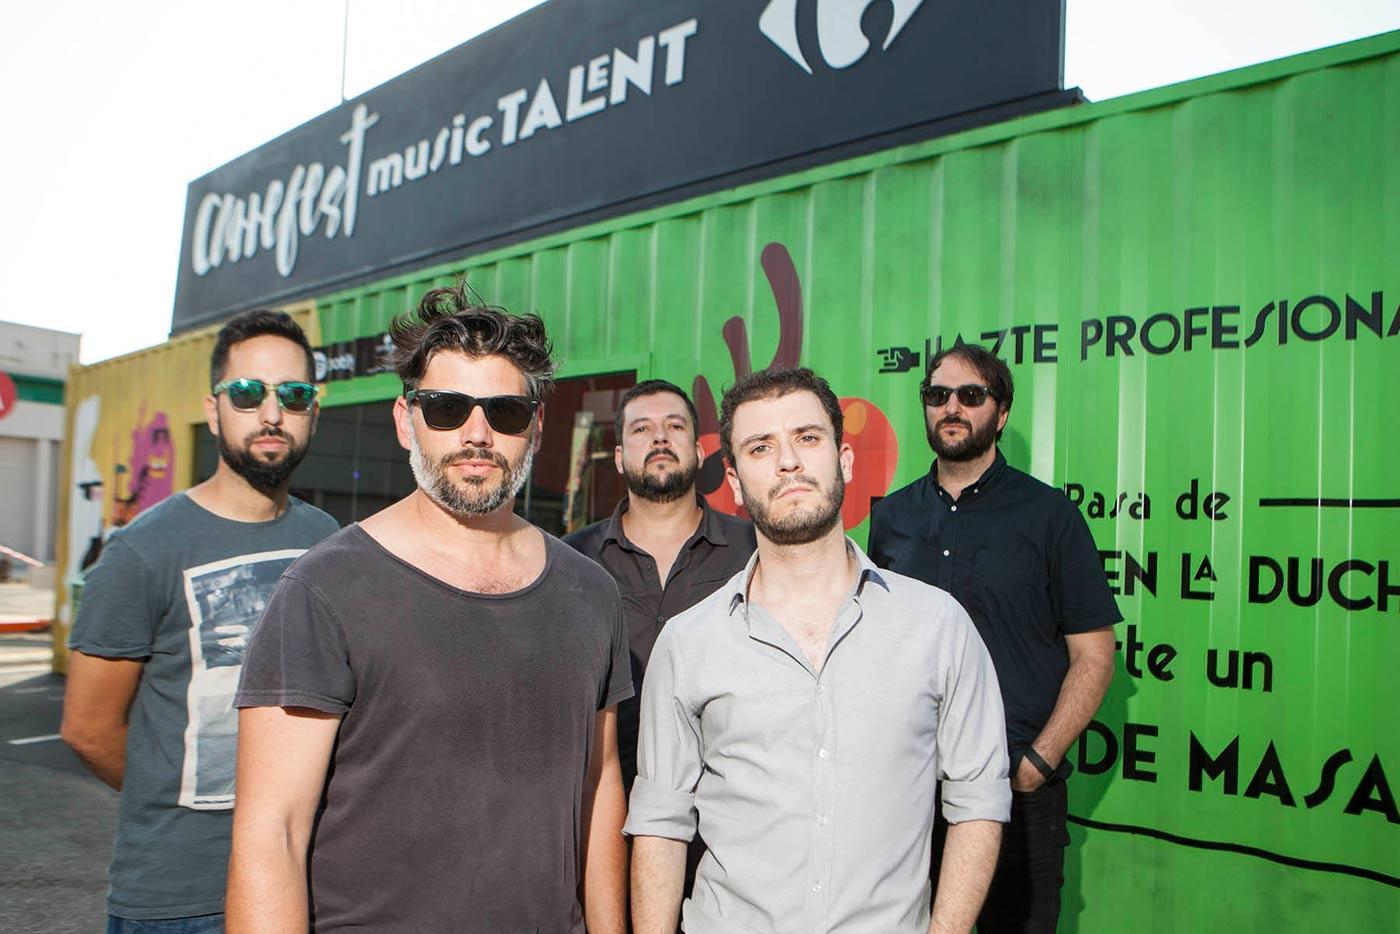 ¡Carrefest Music Talent ya tiene sus ganadores!